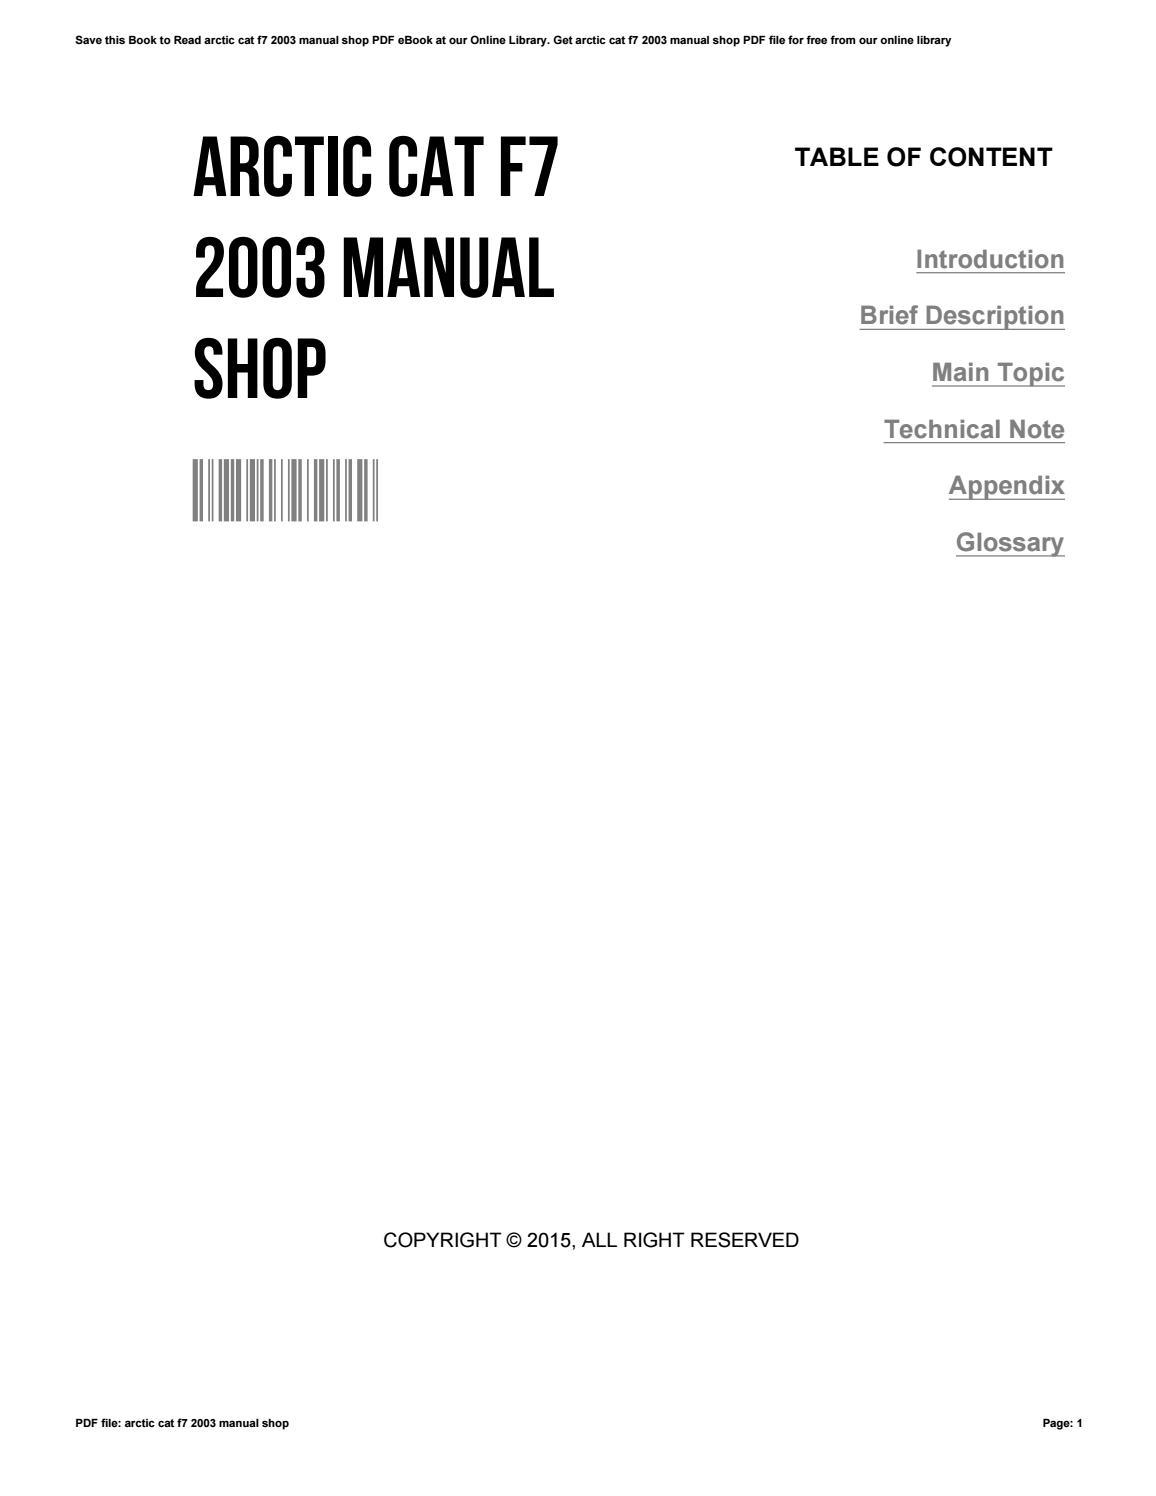 Arctic Cat F7 2003 Manual Shop By Maureenhillman3843 Issuu